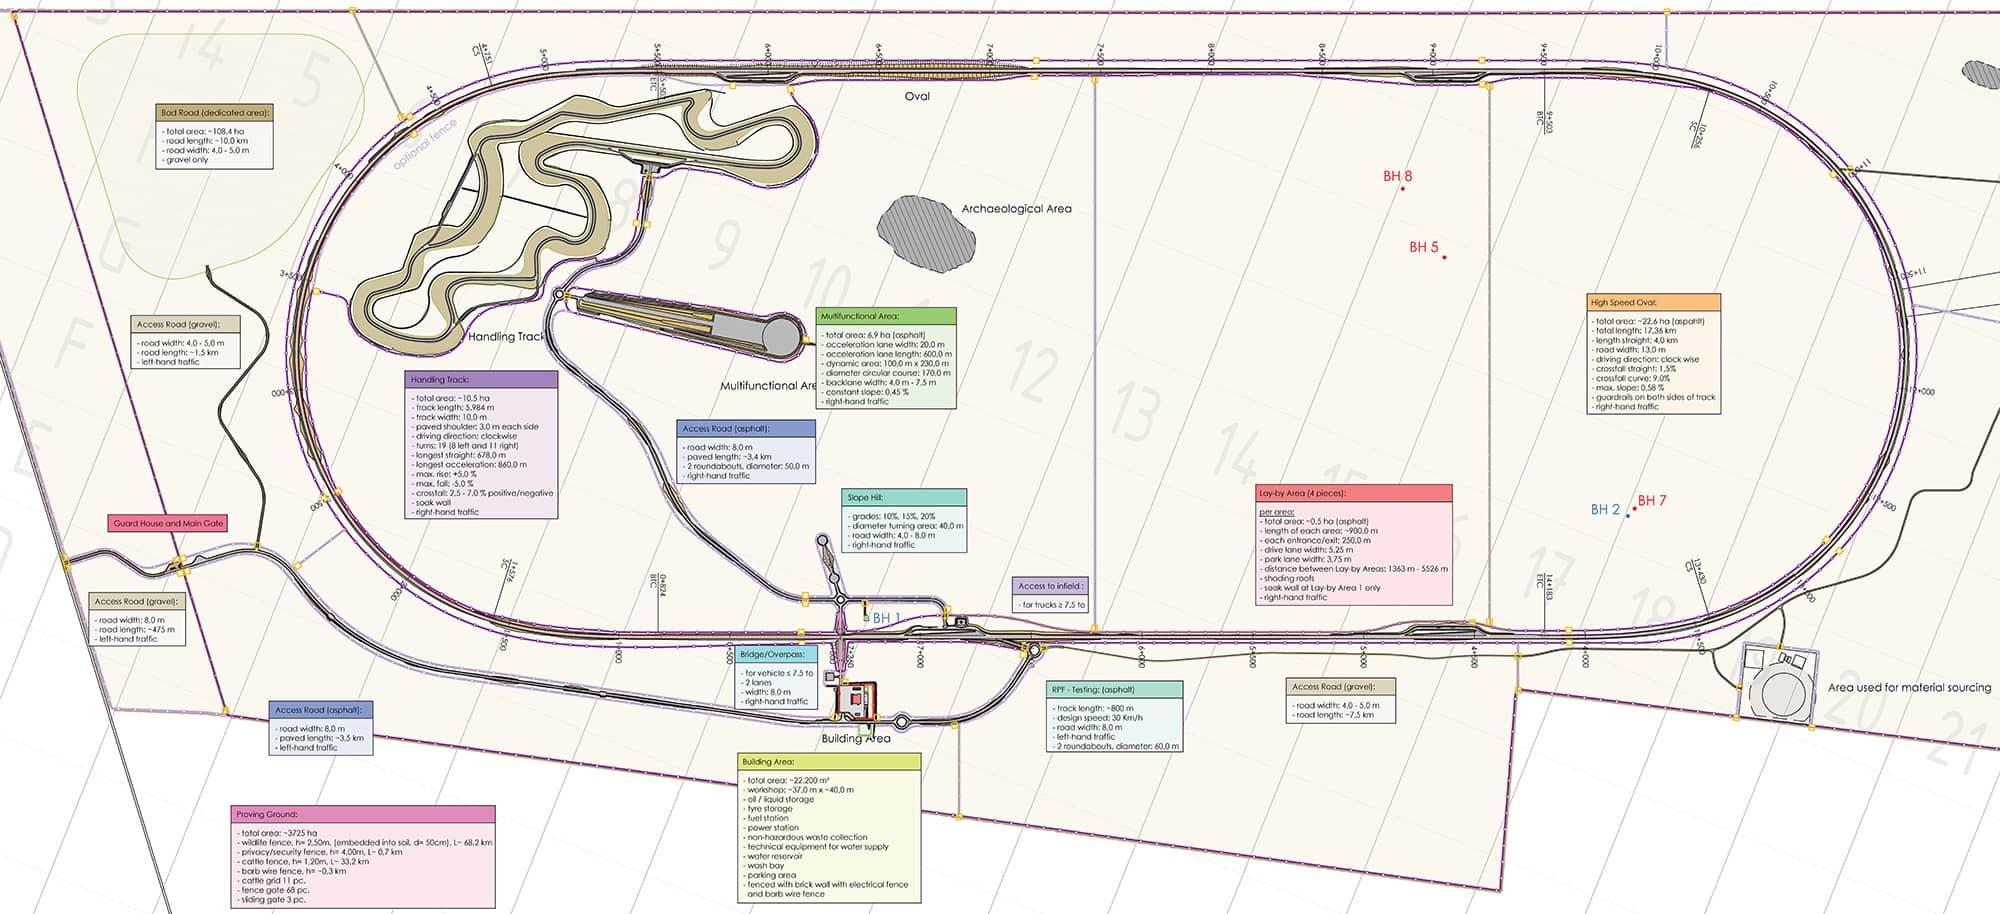 DAIMLER Proving Ground for arid hot climate testing Upington